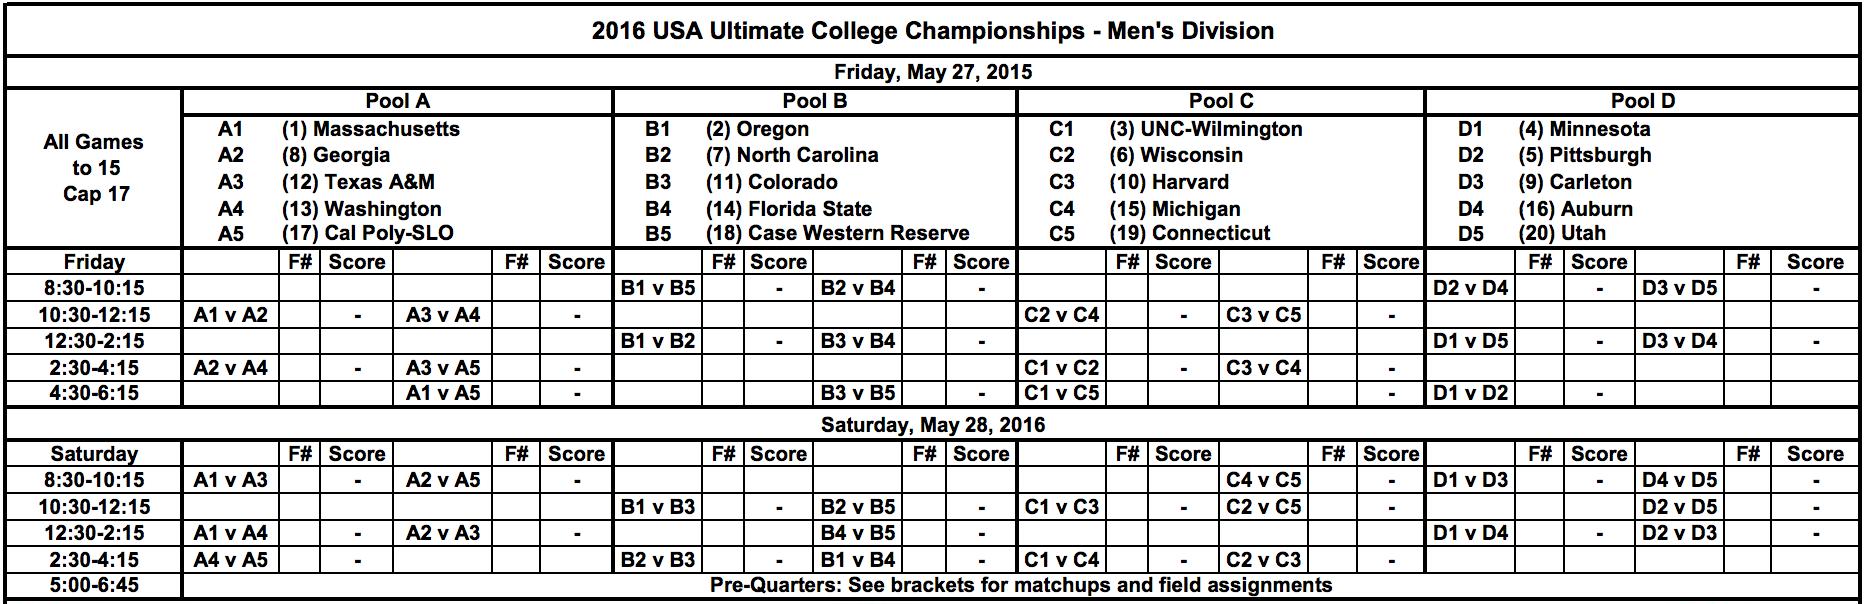 2016 College Championships: Men's Division Pools